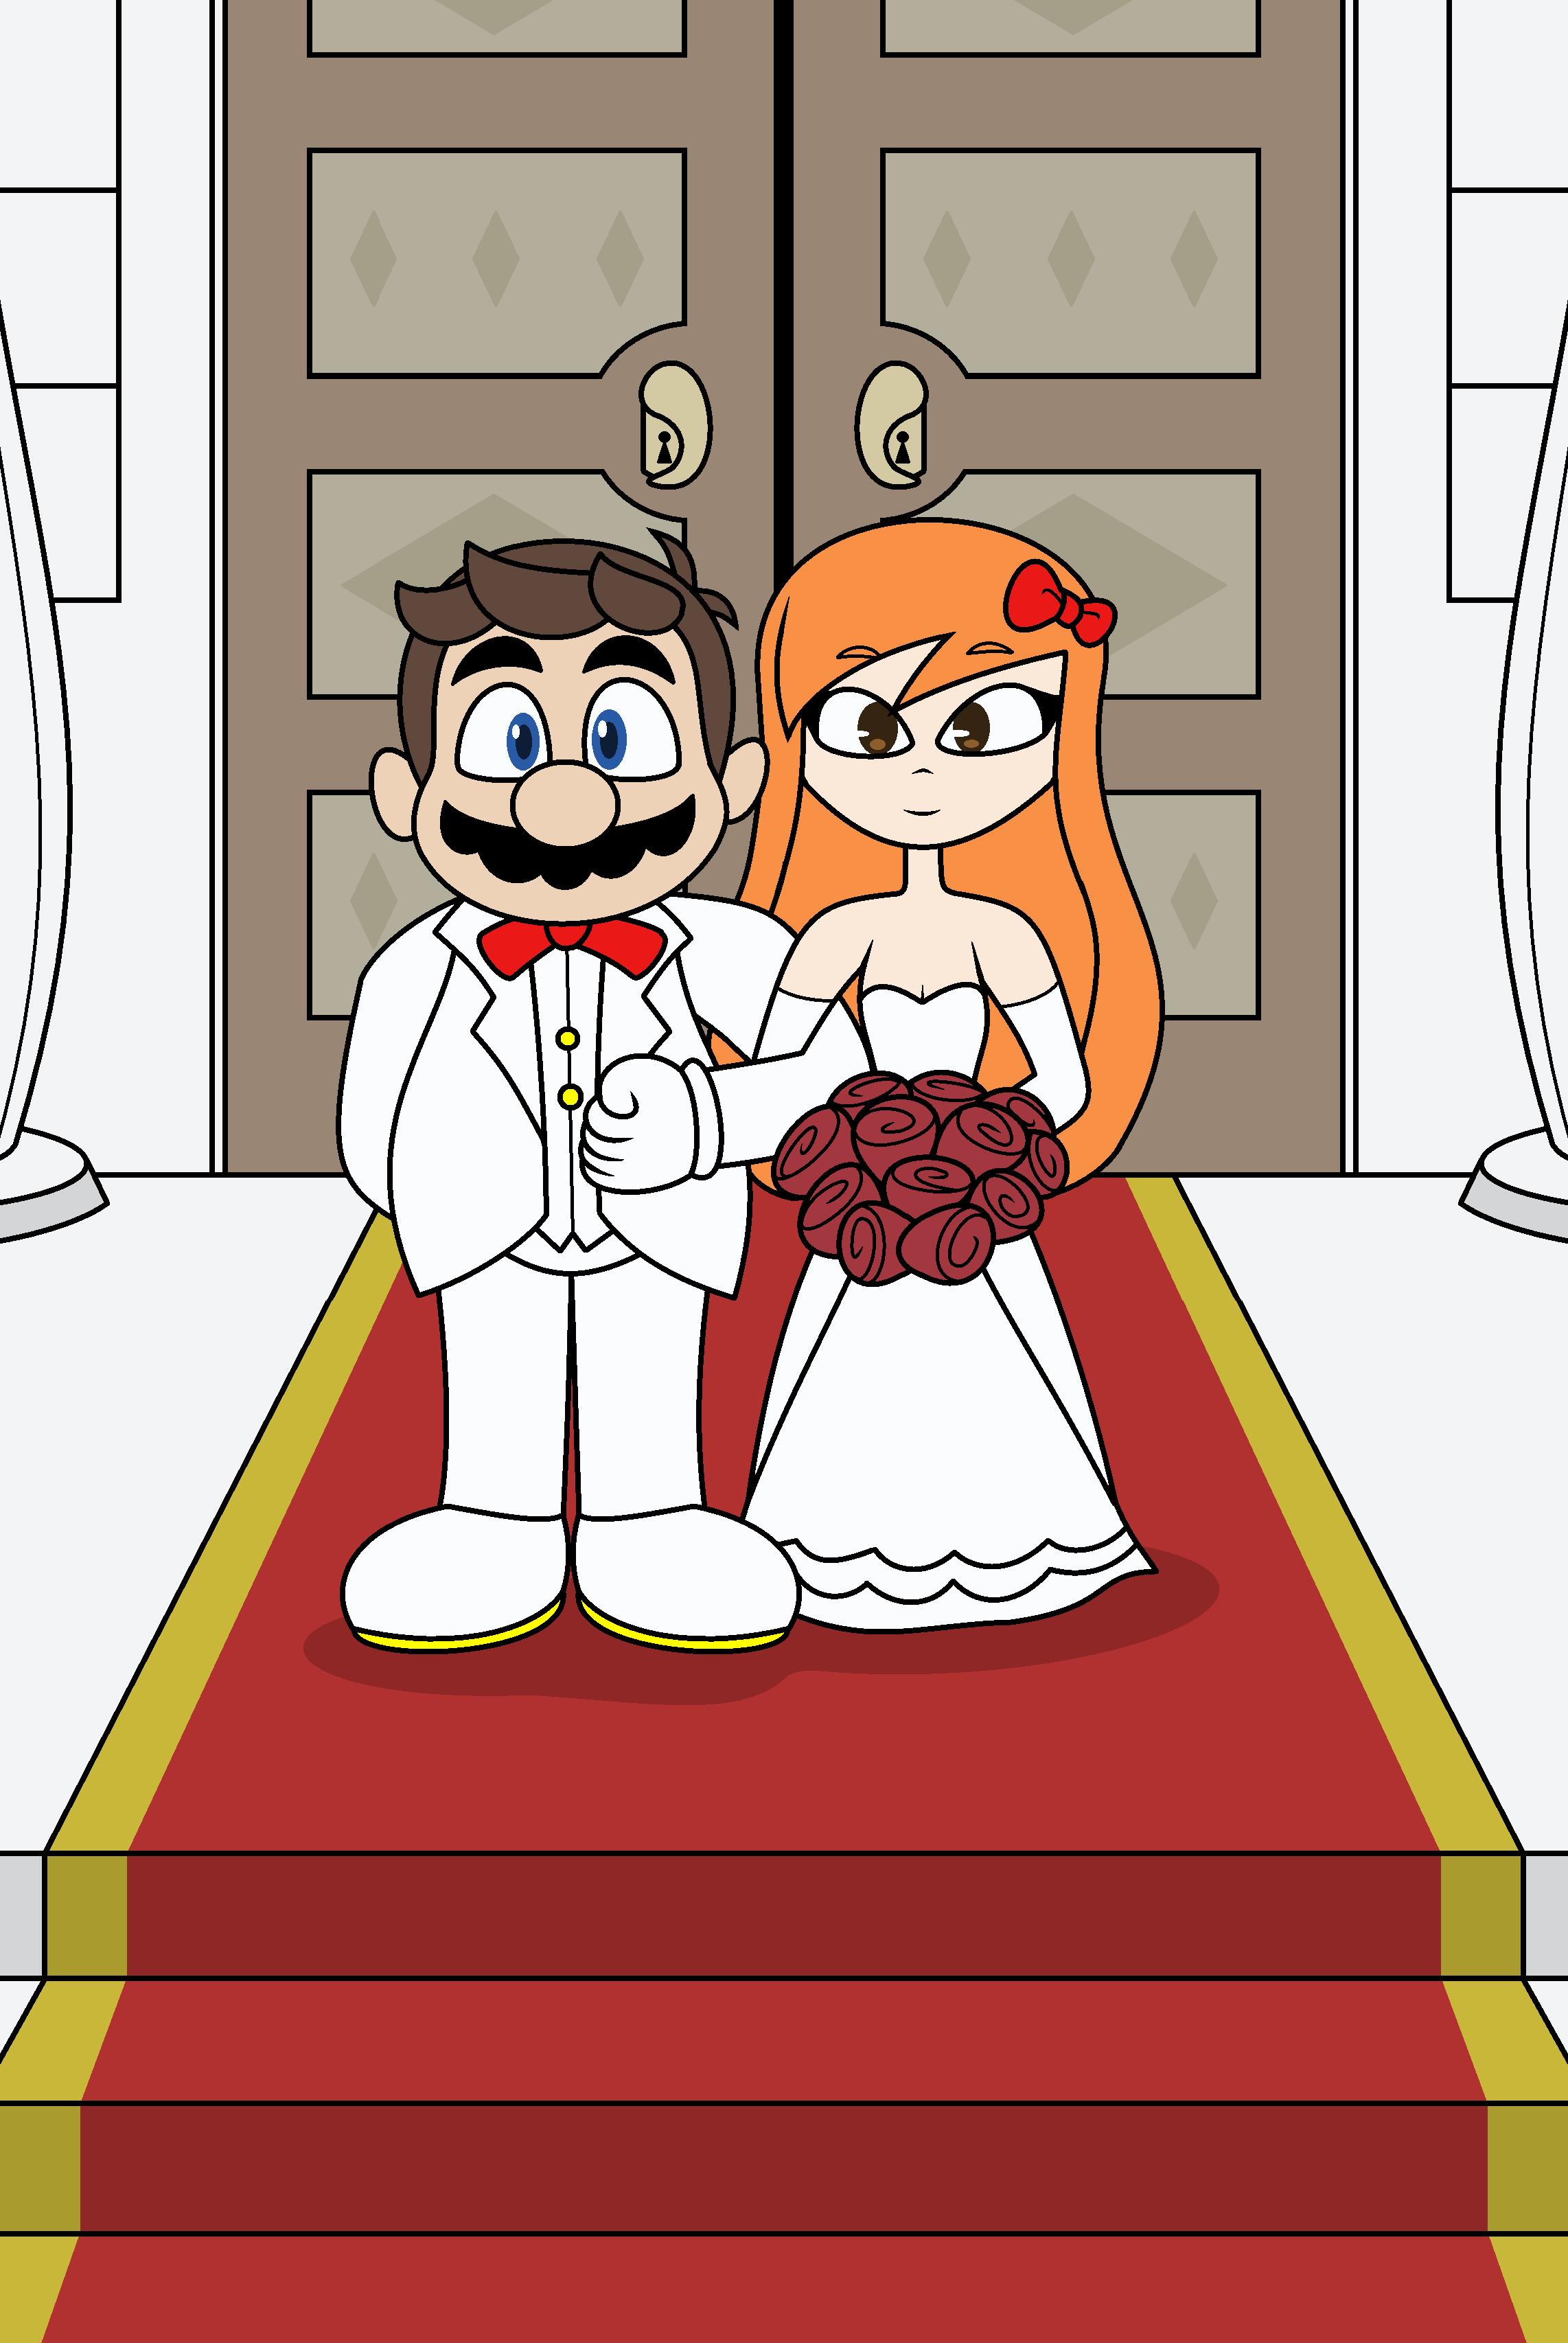 Mario and Meggy's wedding